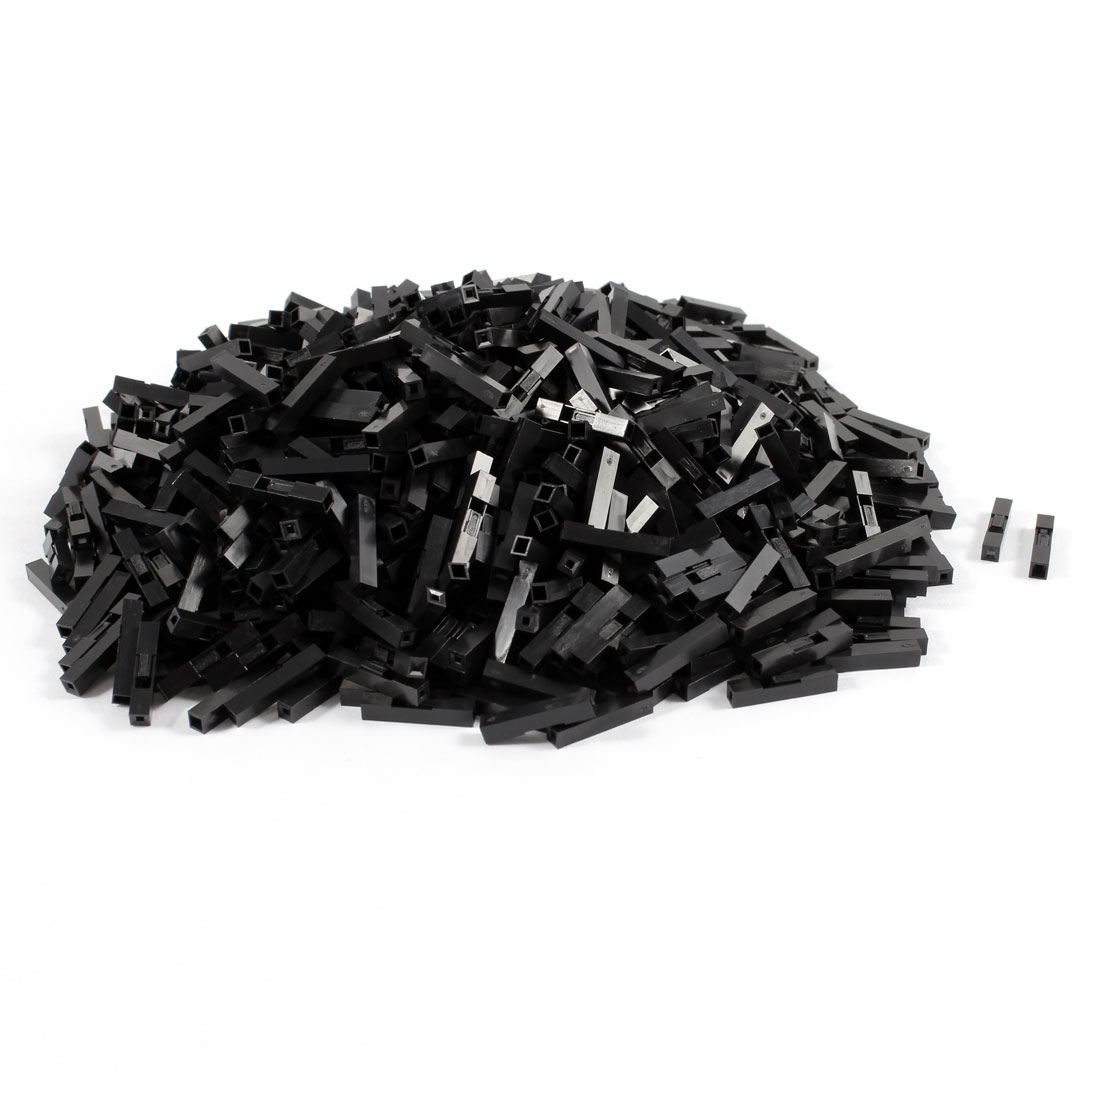 1000 Pcs Black Plastic 1 Pin Female 2.54mm Pitch Car Auto PC PSU ATX Connector